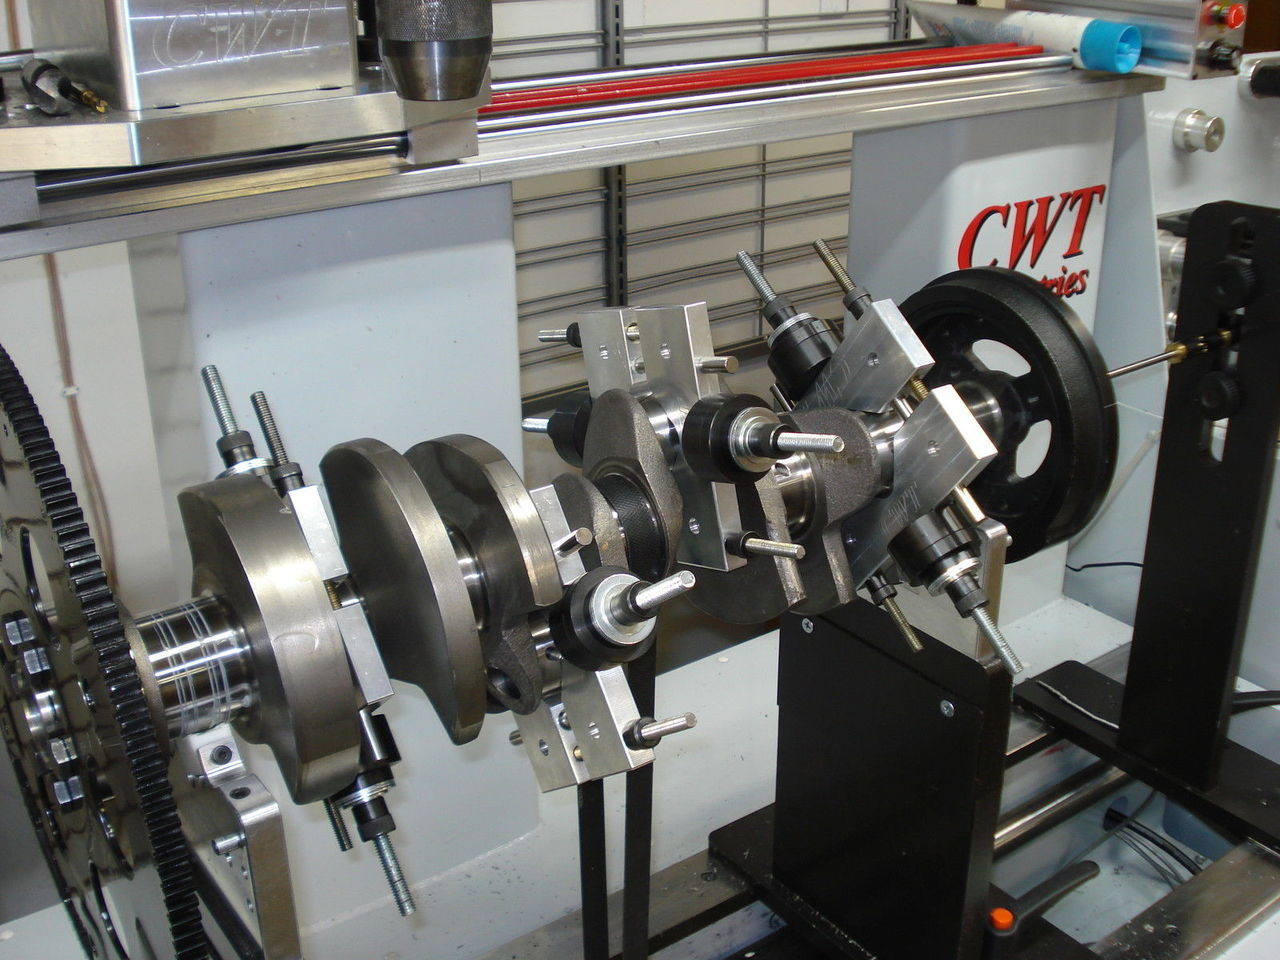 383 Stroker Kit For Lt1 Sb Chevy Mootorsportsunlimited Com